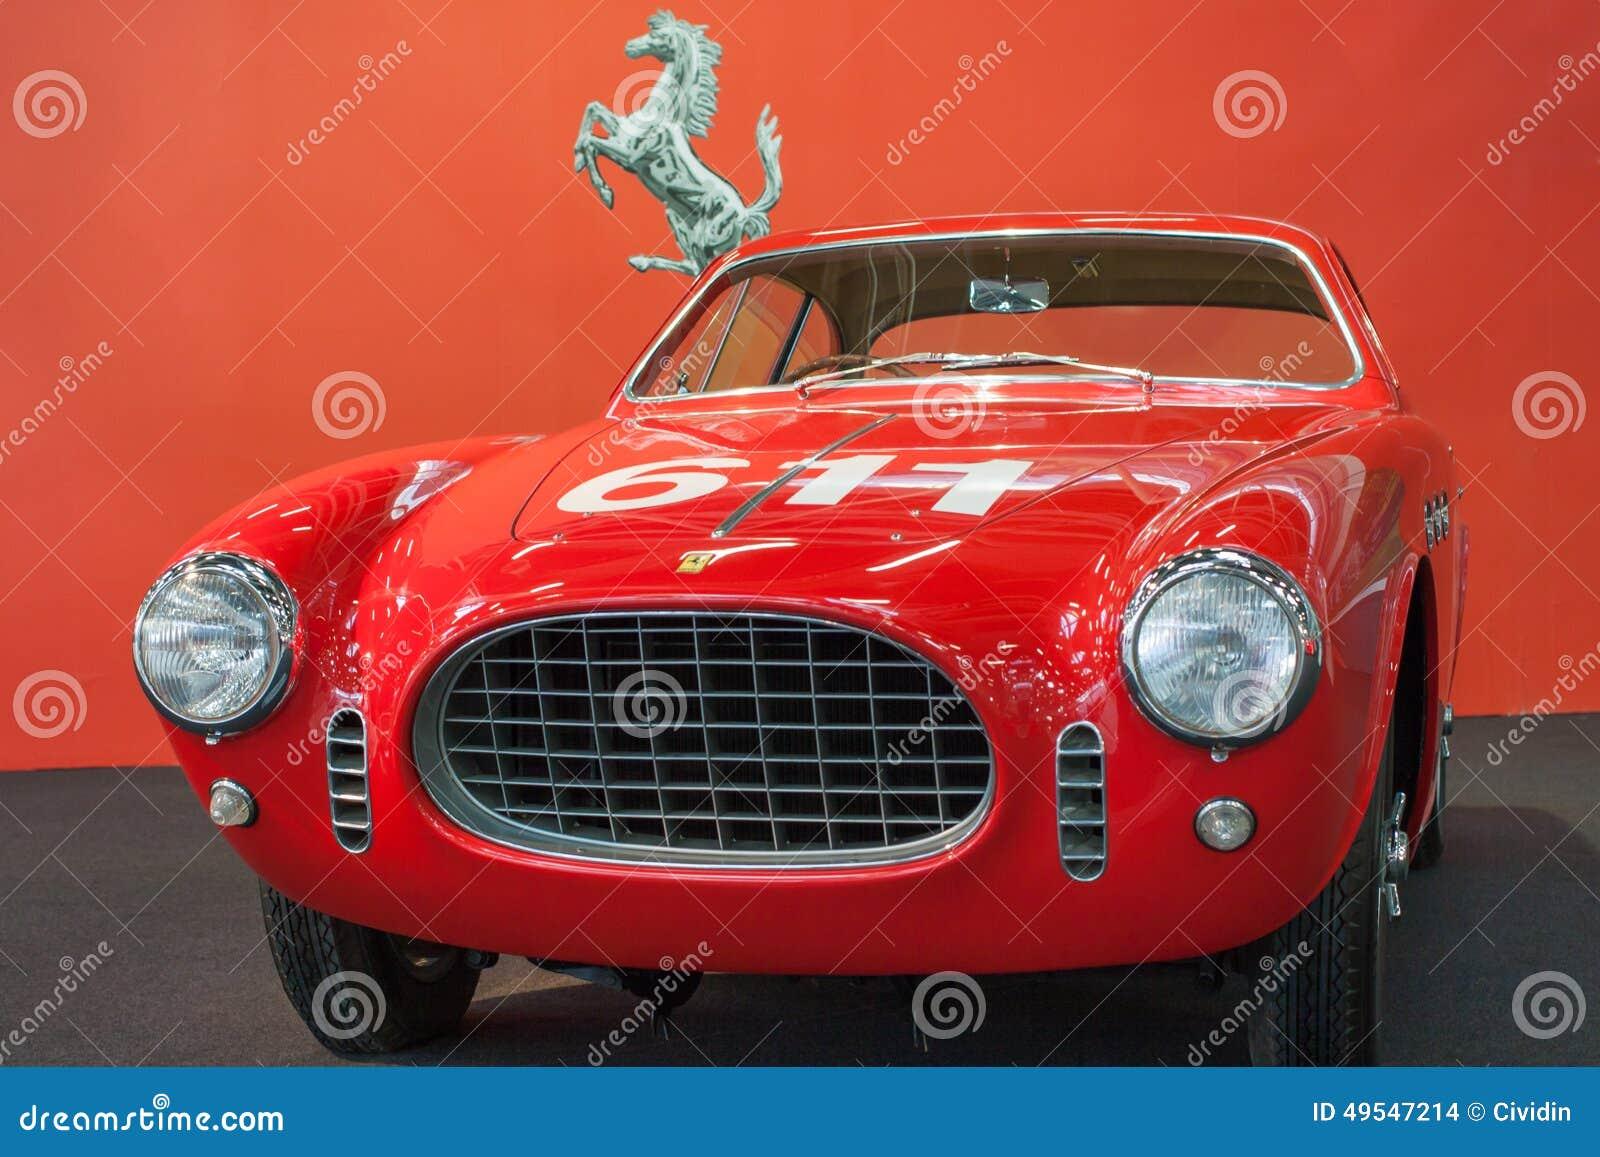 Ferrari 250 S Editorial Stock Image Image Of Display 49547214